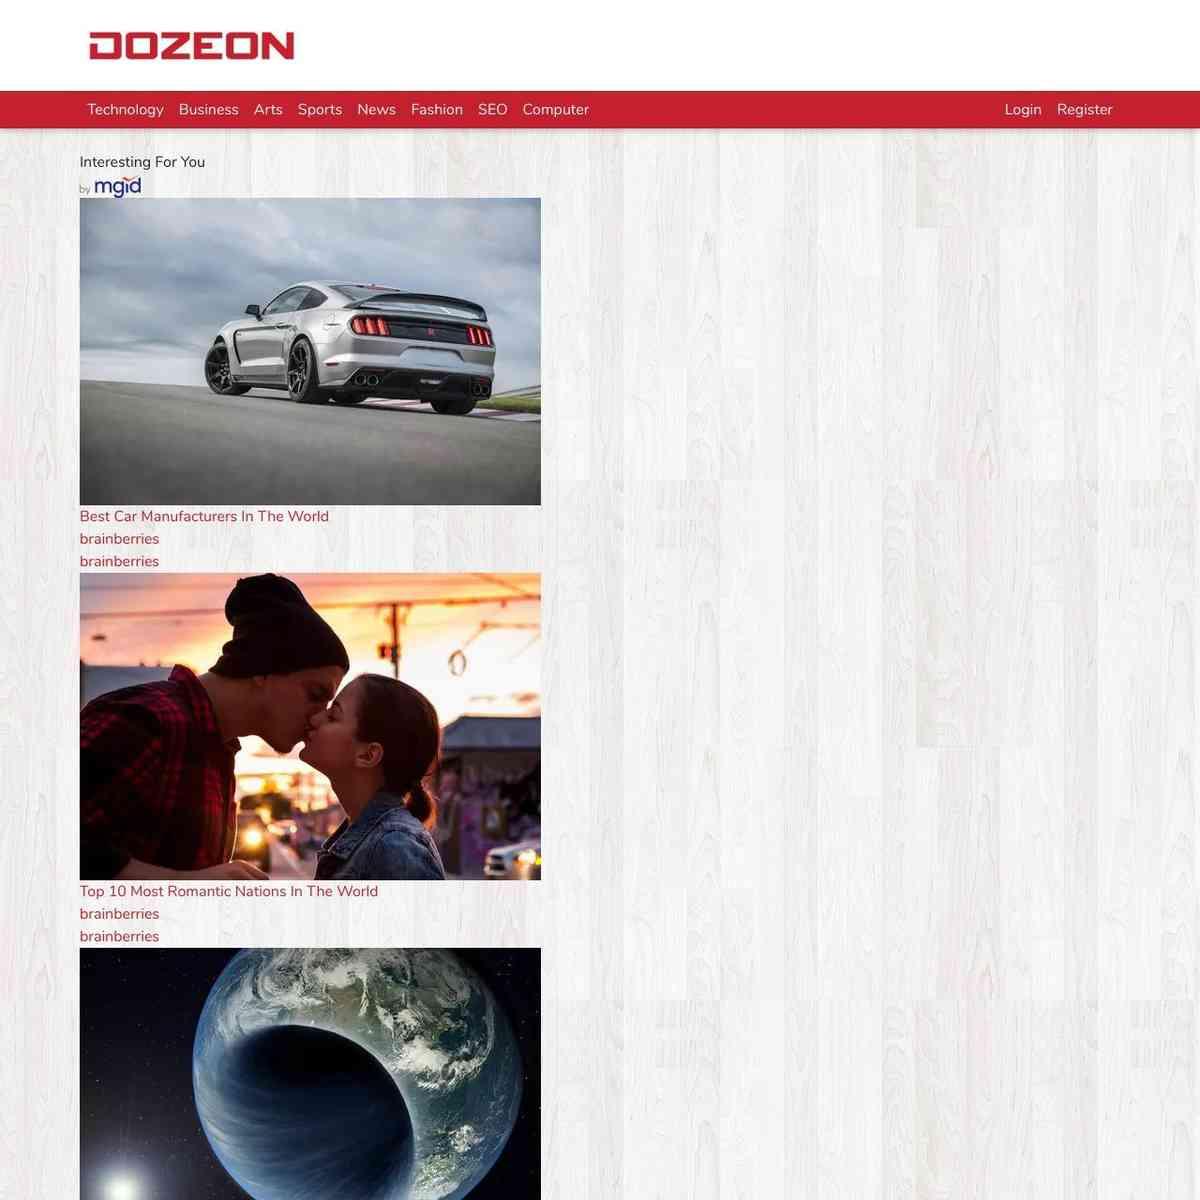 dozeon.com/posts/viyet-discount-coupon-promo-code-offer